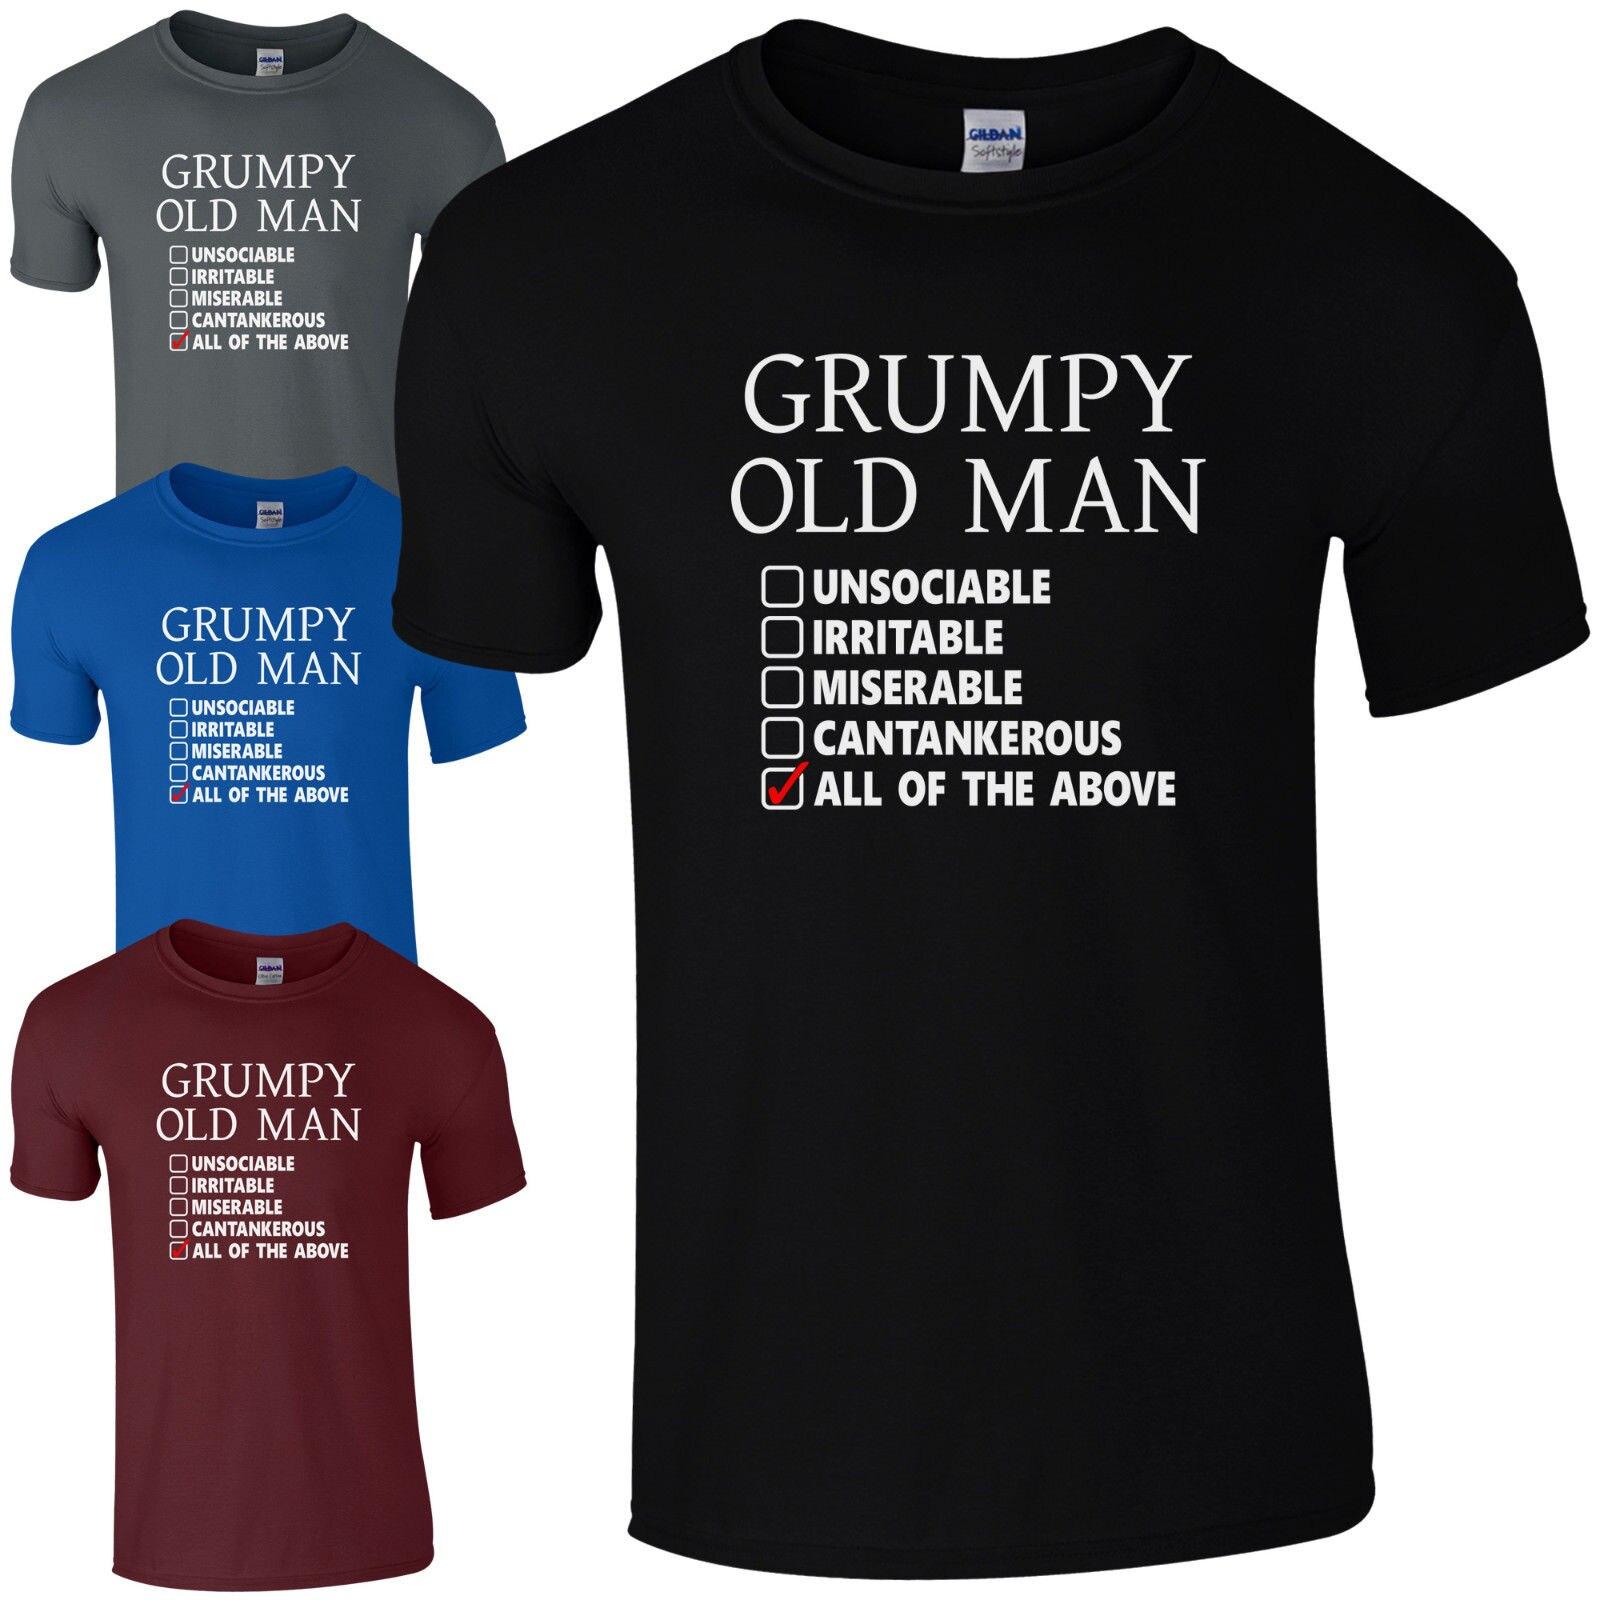 Grumpy Old Man Checklist T-Shirt - Funny Dad Grandad Fathers Day Joke Gift Top